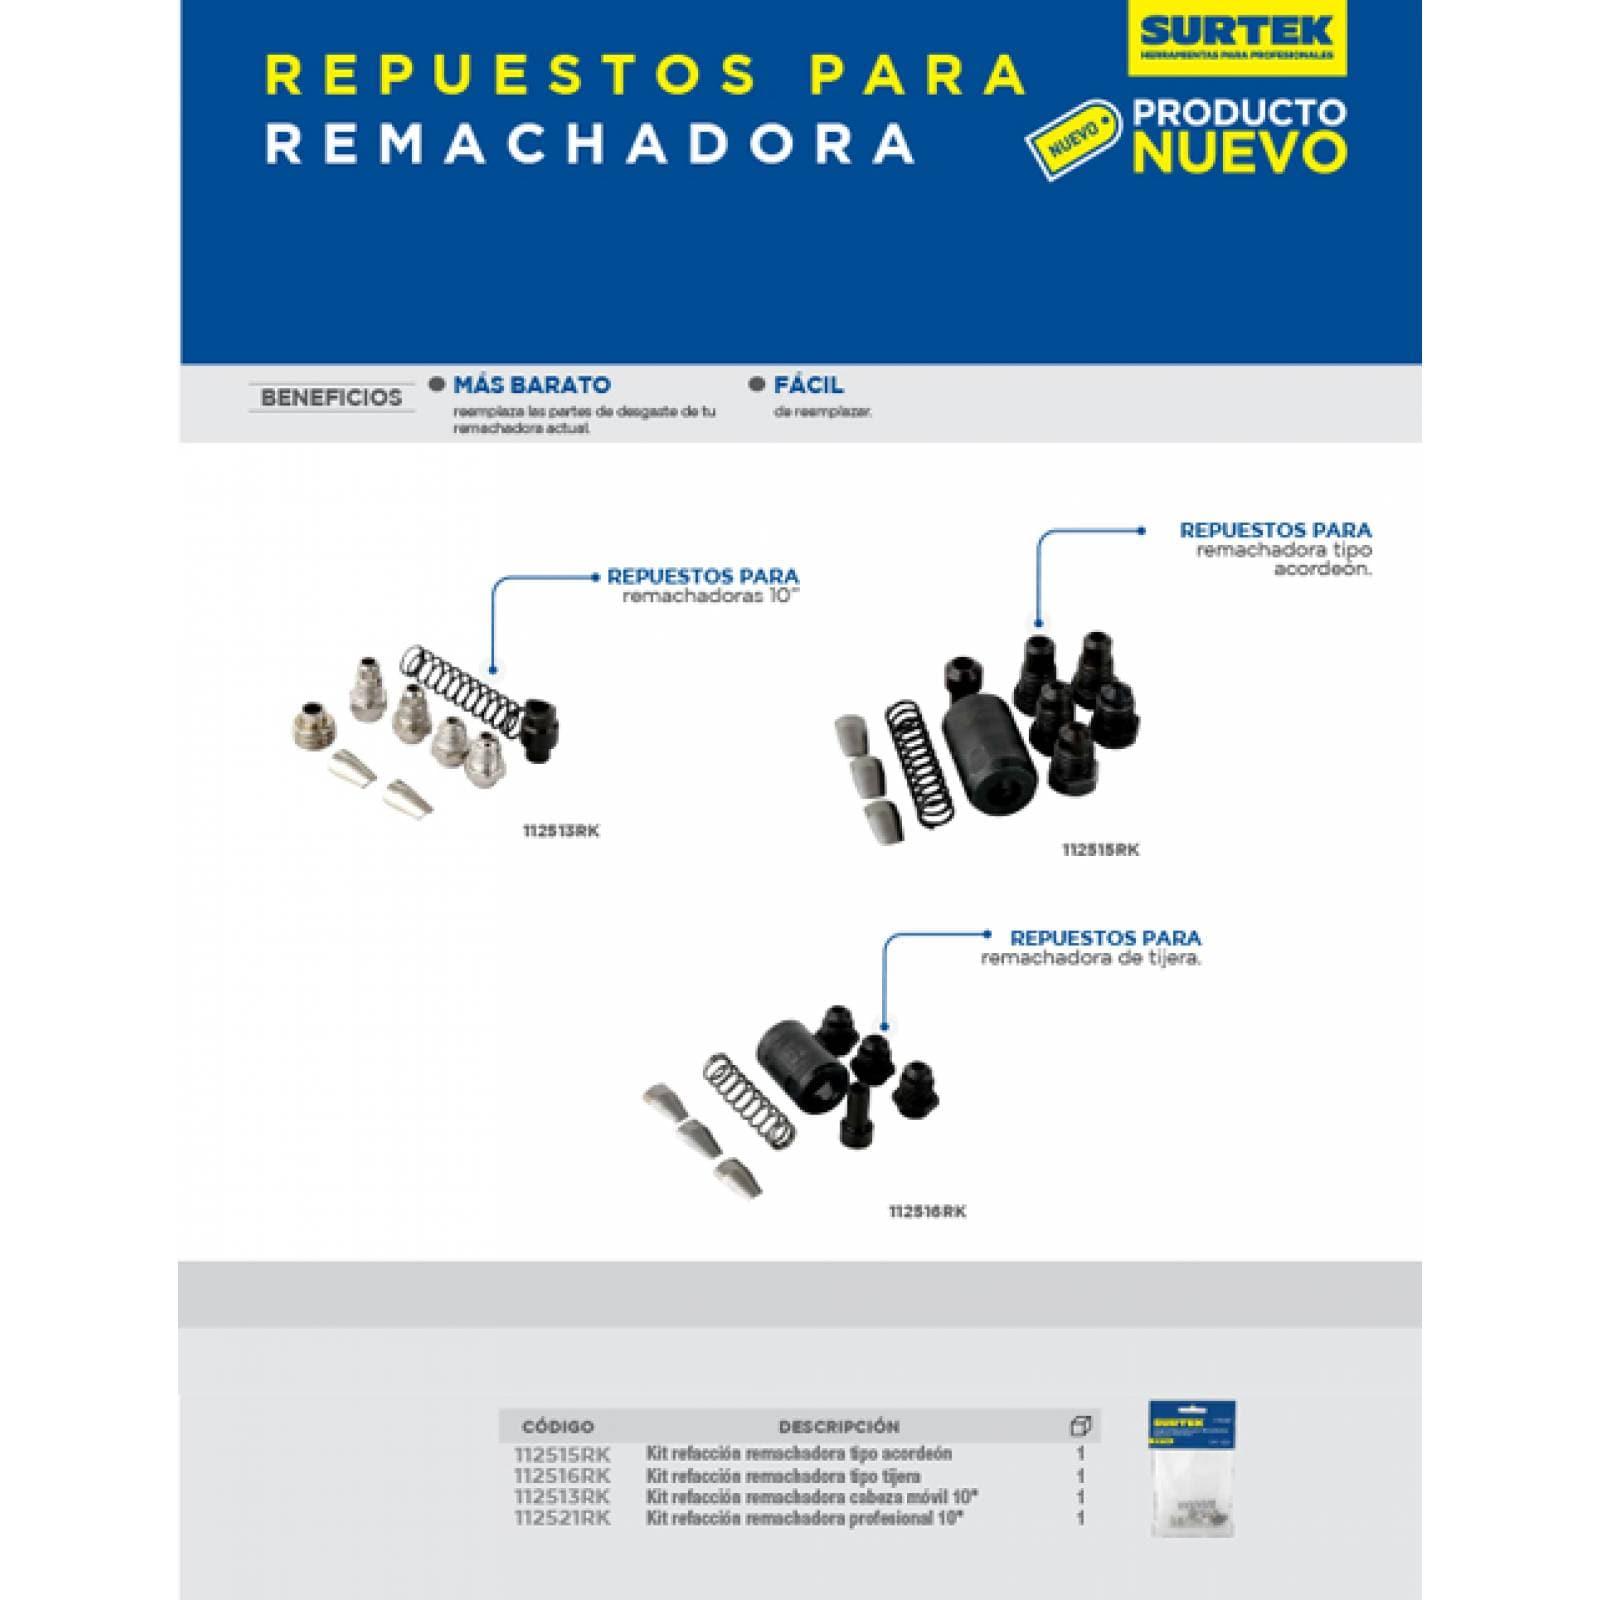 "Kit De Refacción Remachadora Profesional 10"" 112521RK Surtek"